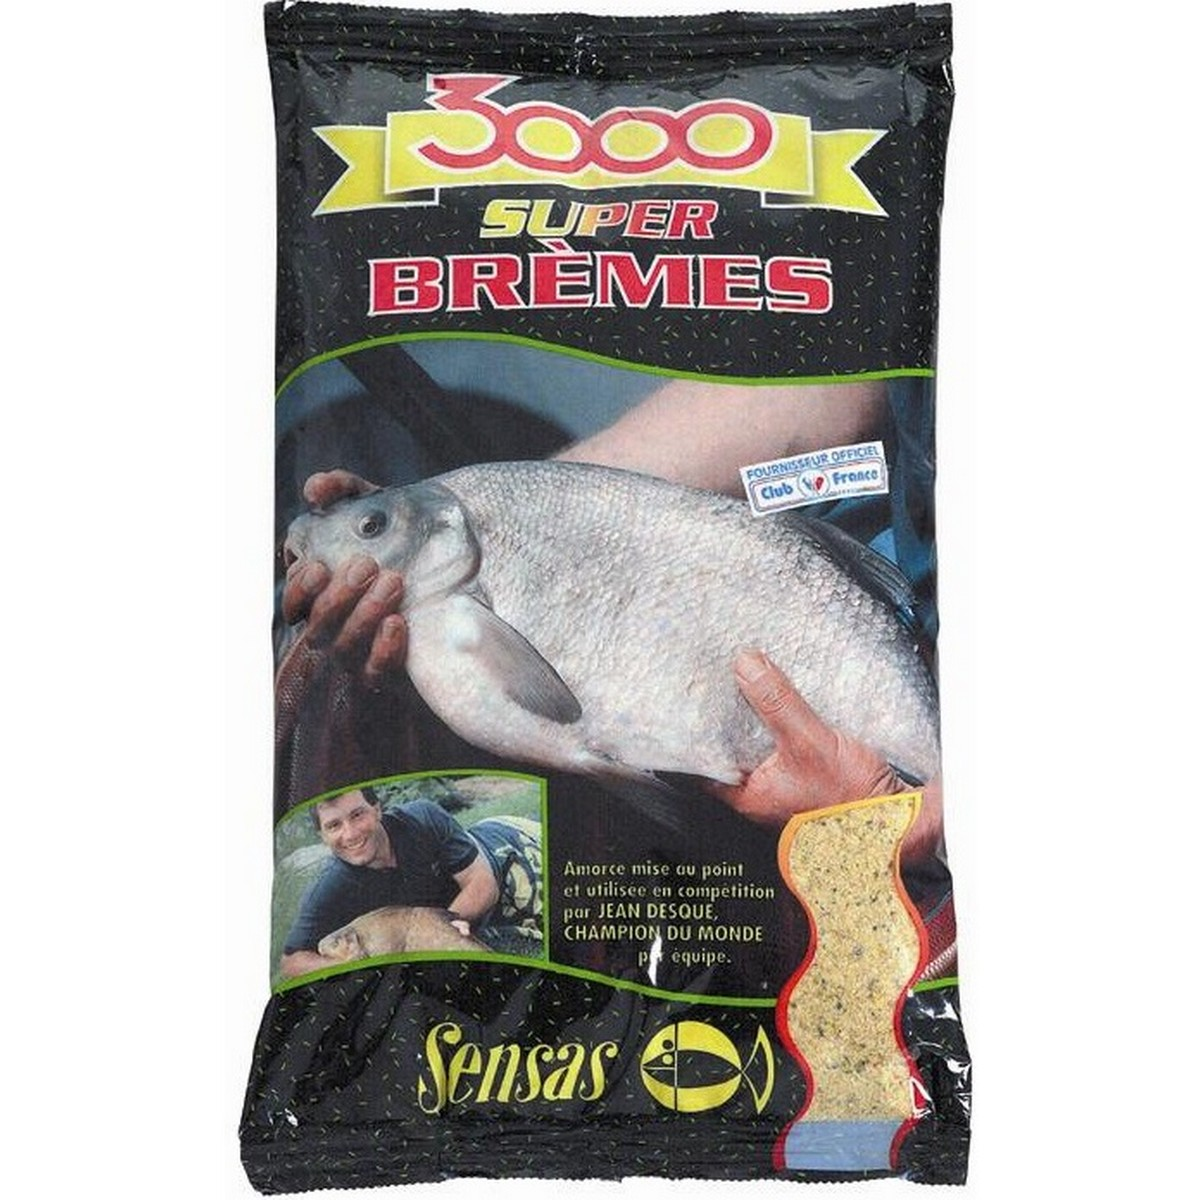 Захранка за риболов Sensas 3000 Super Bremes